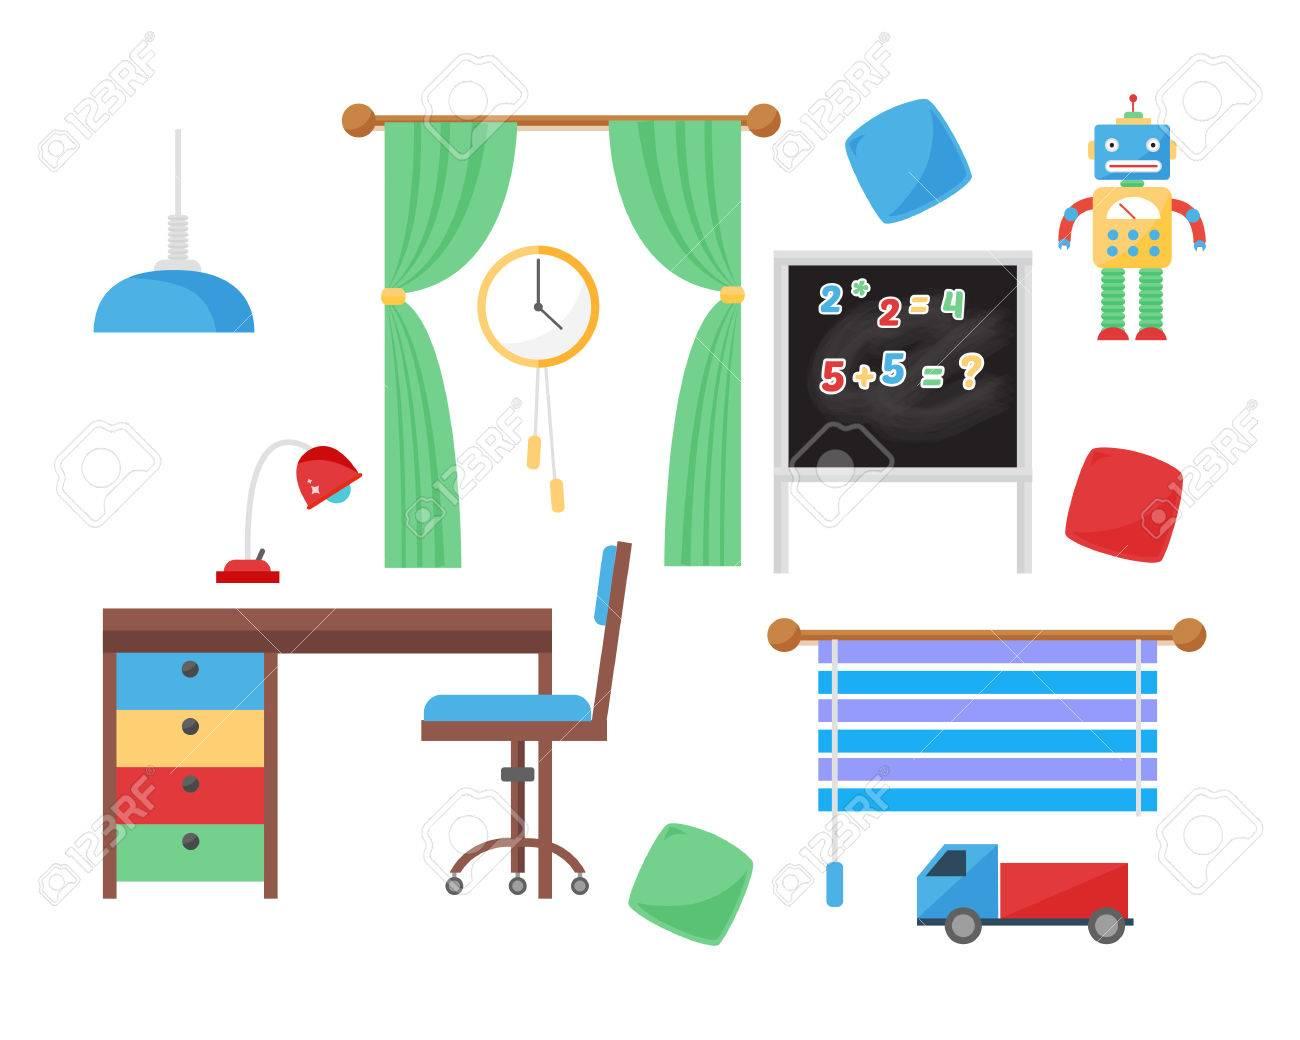 Comfortable cozy baby room decor children bedroom interior with..